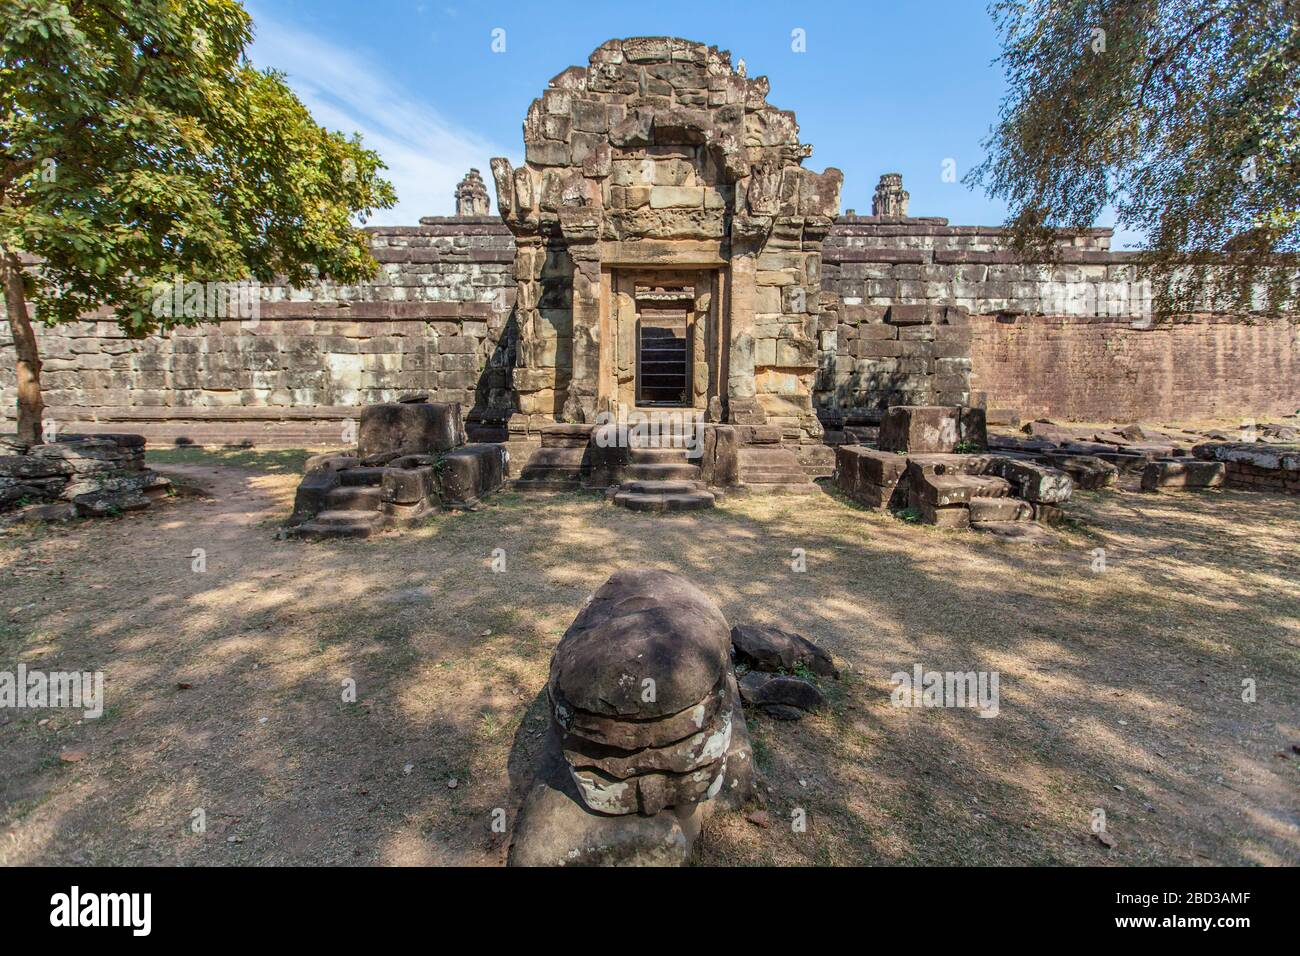 Bakong Prasat temple in Angkor Wat complex, Siem Reap, Cambodia. Stock Photo